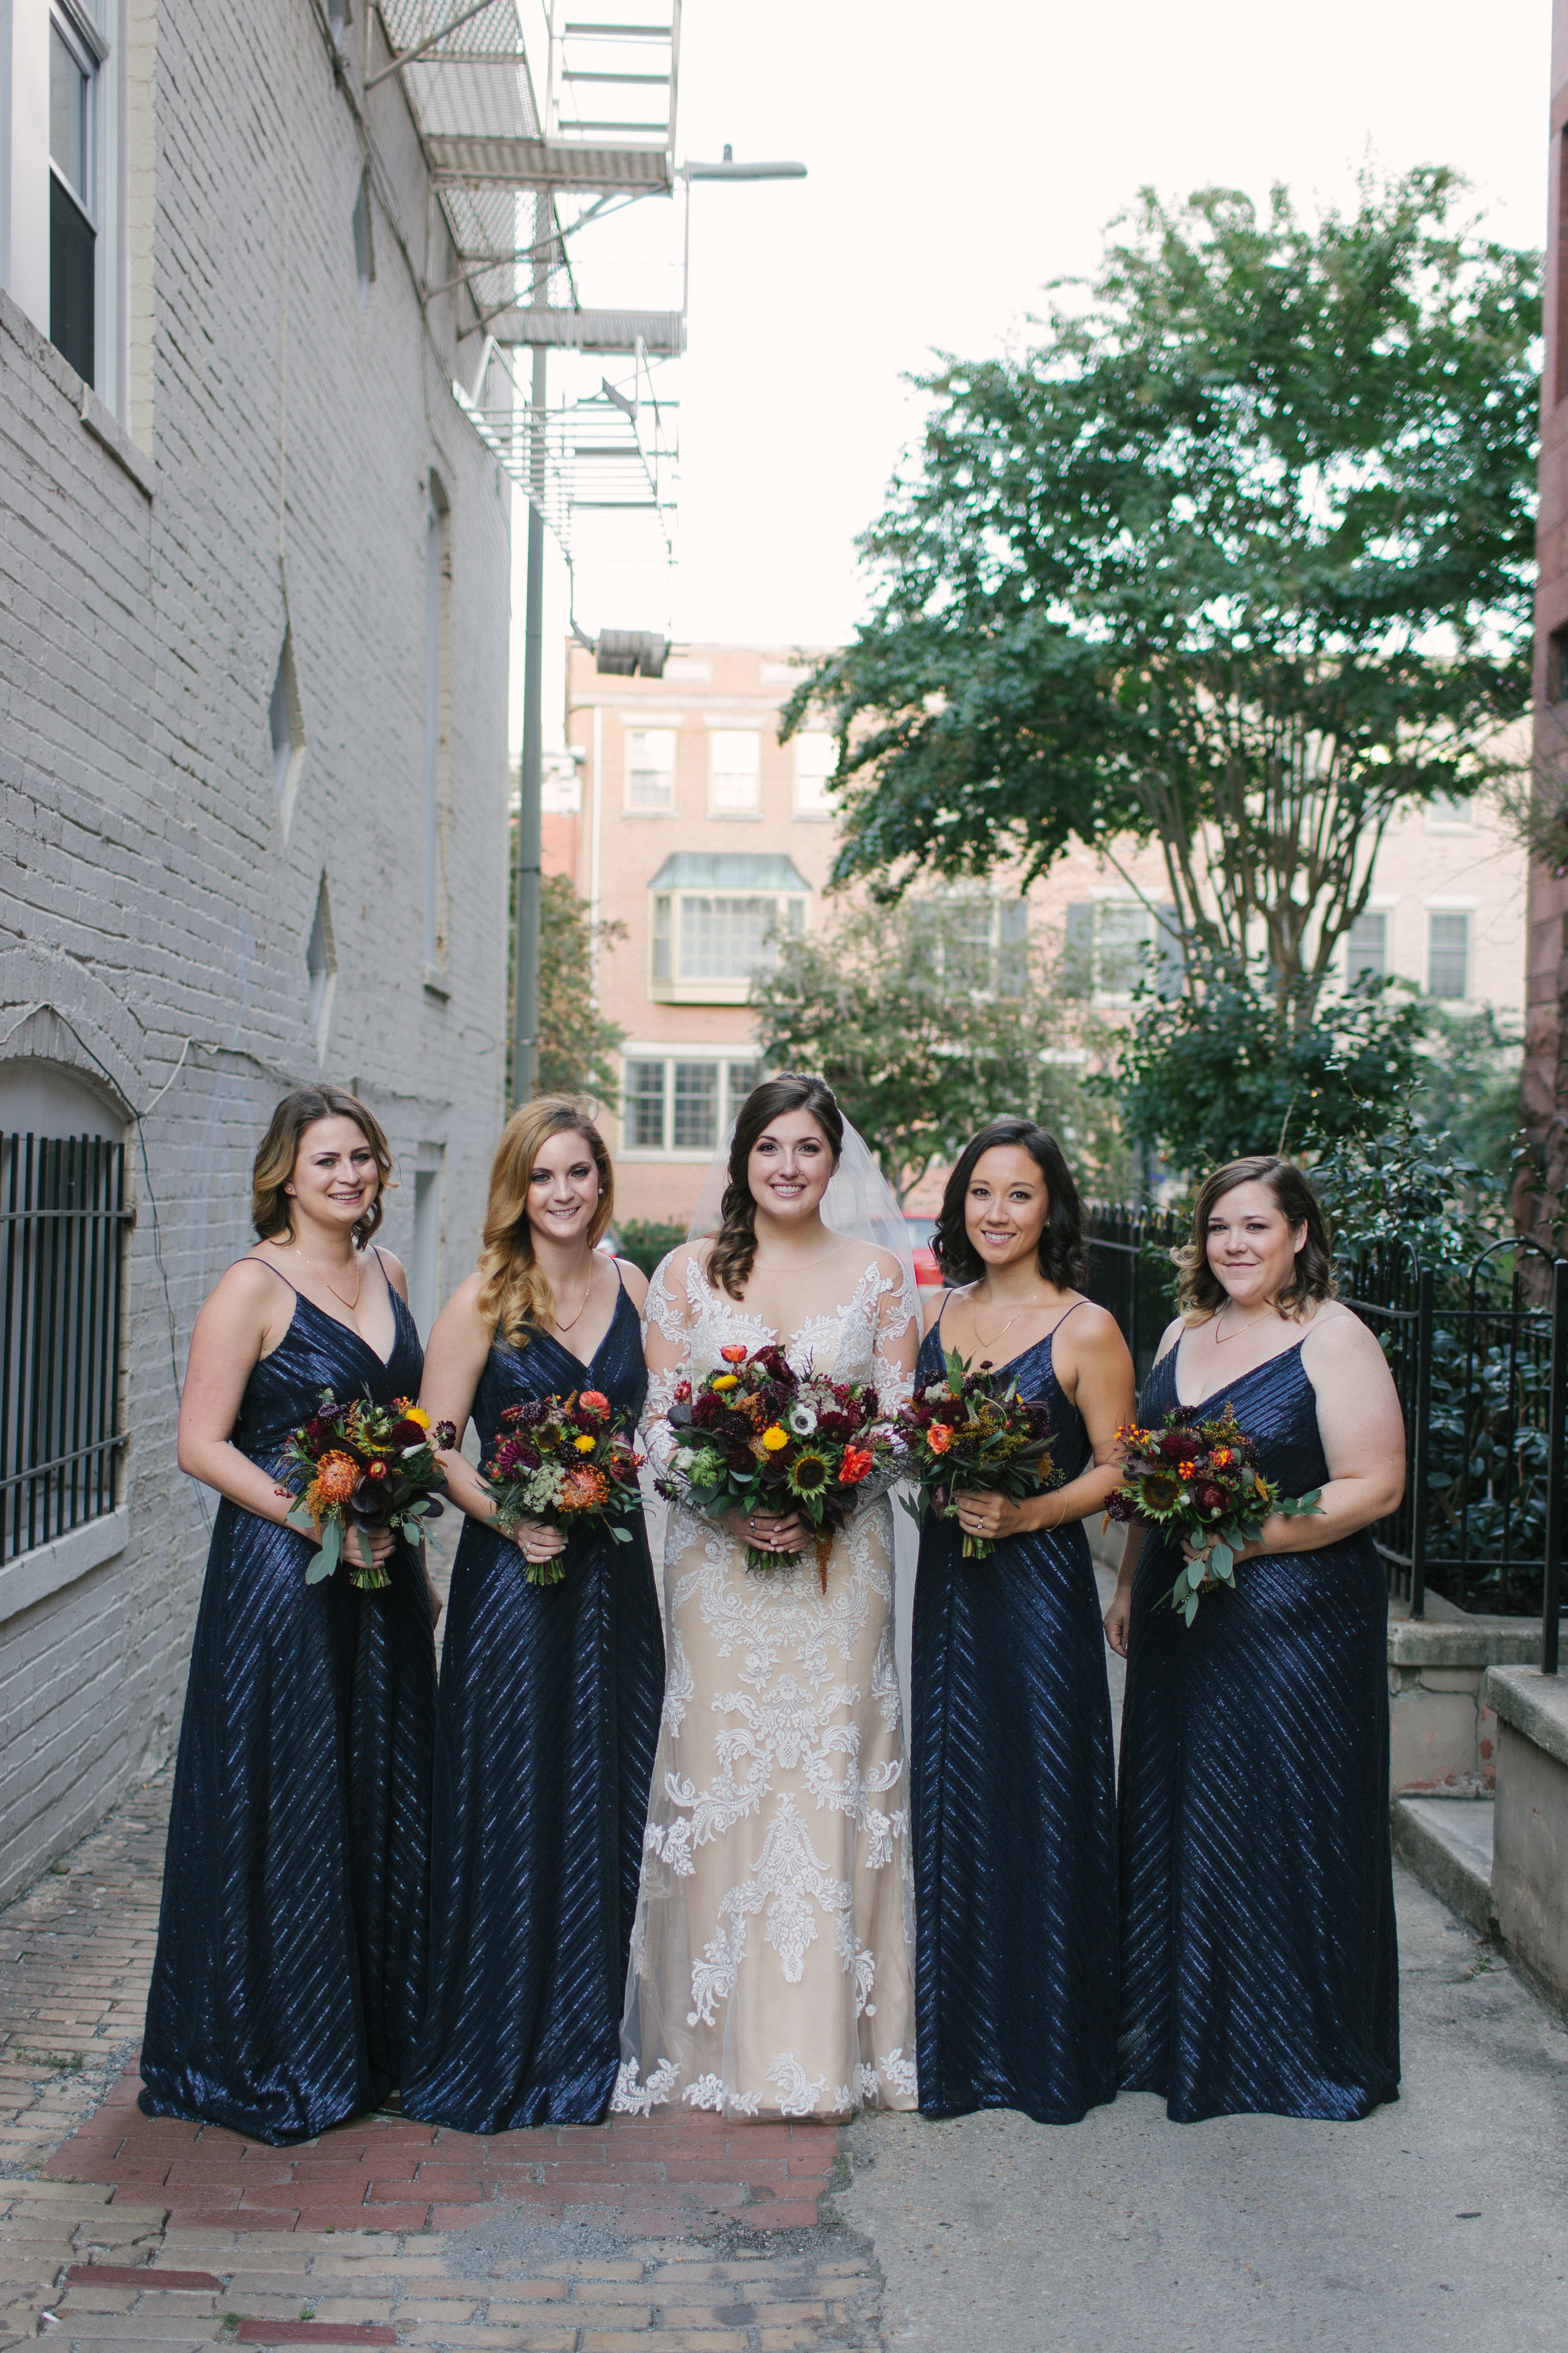 Dupon Circle Wedding | Washington DC Wedding Photography | Rebecca Wilcher Photography -12.jpg